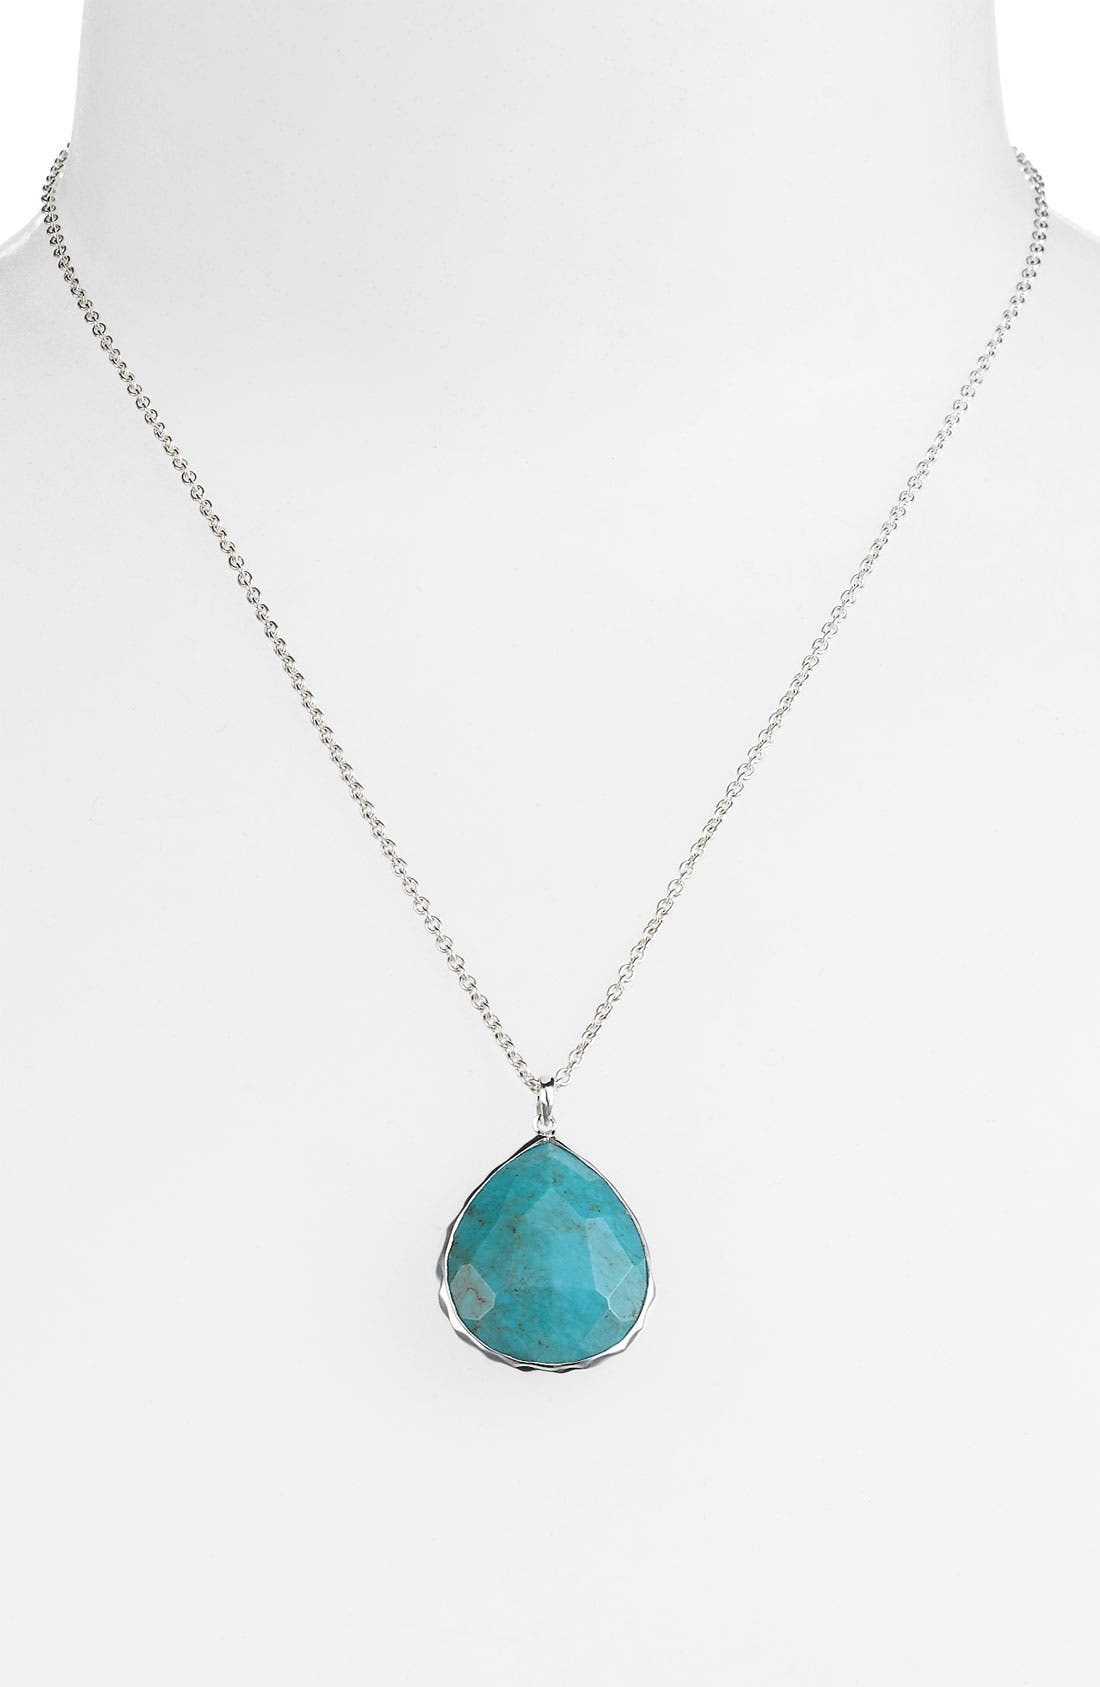 Main Image - Ippolita 'Rock Candy' Large Teardrop Pendant Necklace